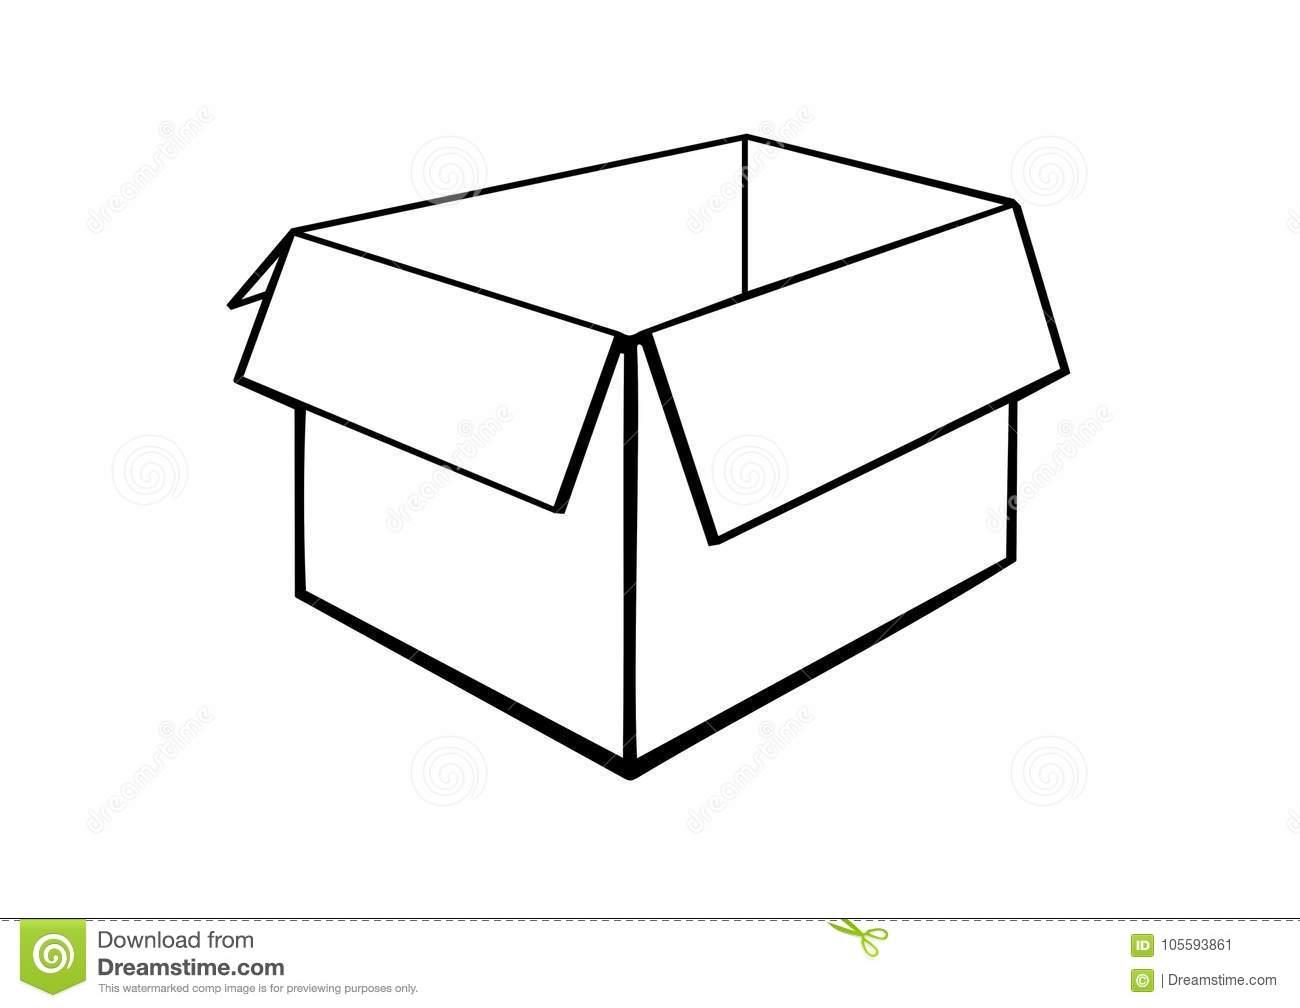 An opened cardboard box. stock vector. Illustration of cardboard.